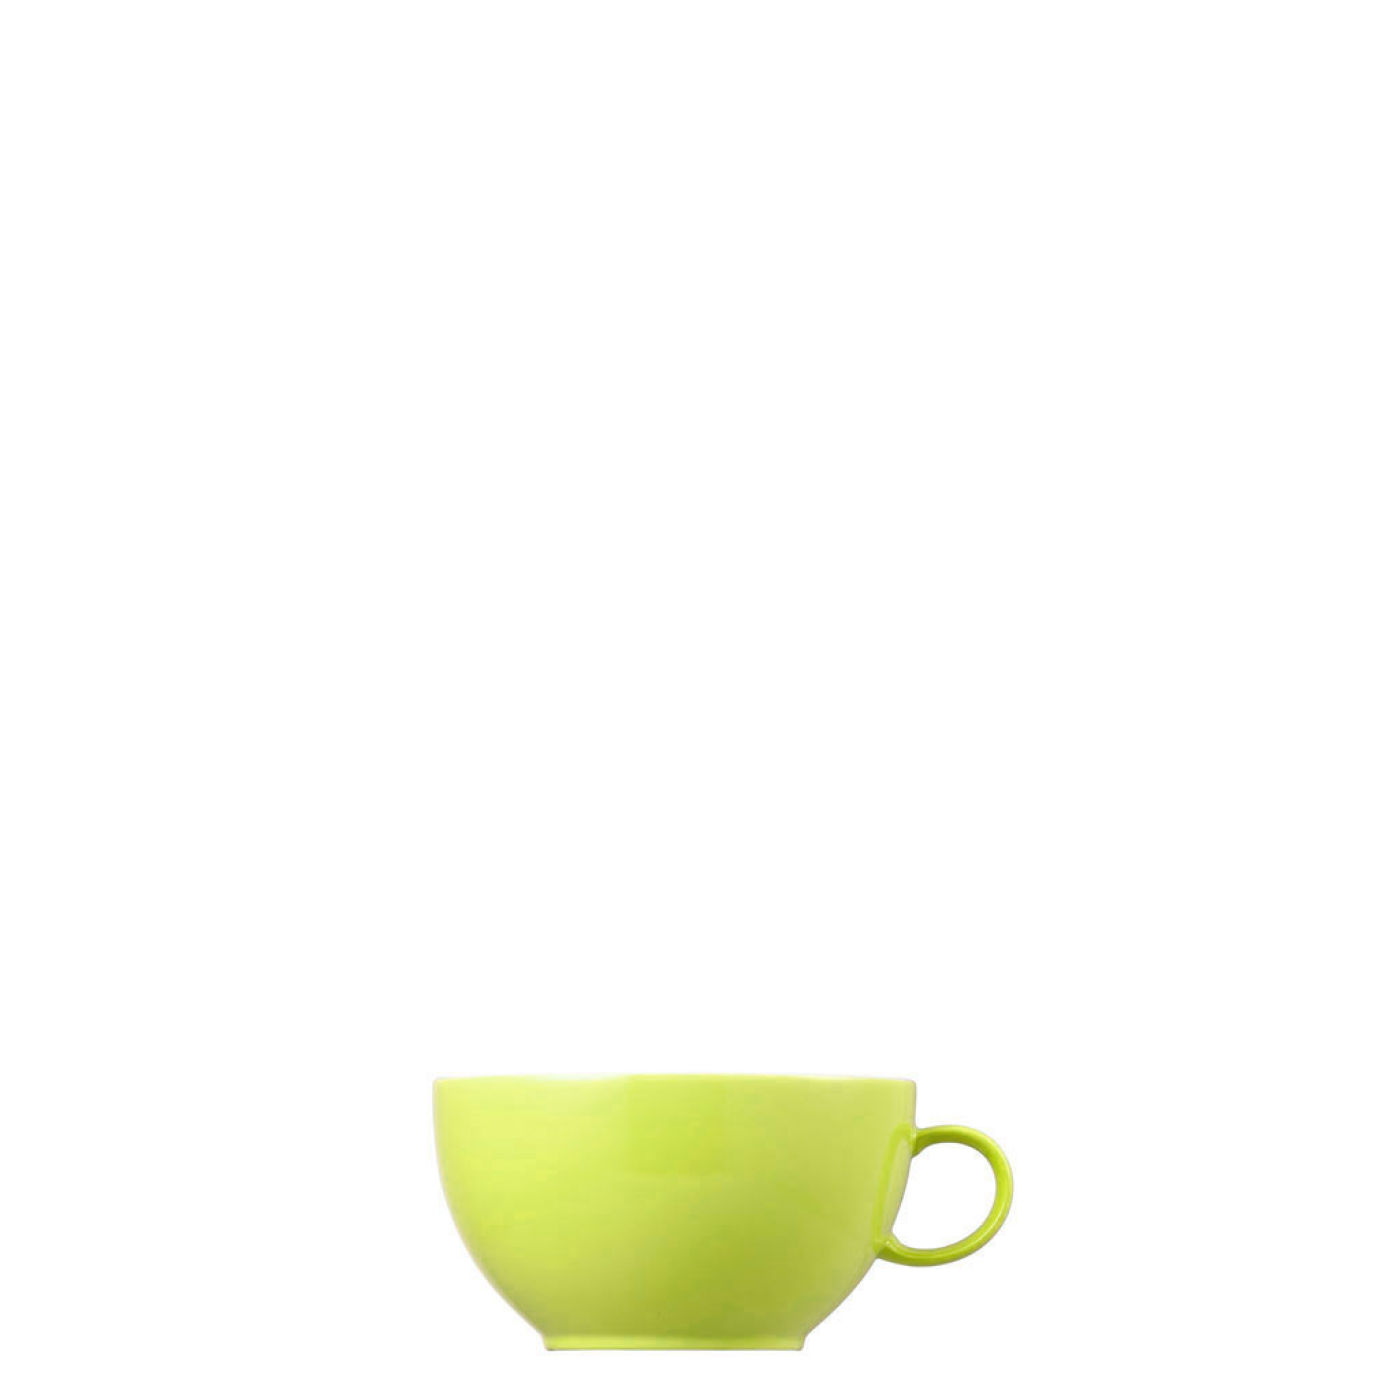 Набор столовый на 2 персоны Rosenthal SUNNY DAY, желтый, 10 предметов Rosenthal 10850-408535-28010 фото 4